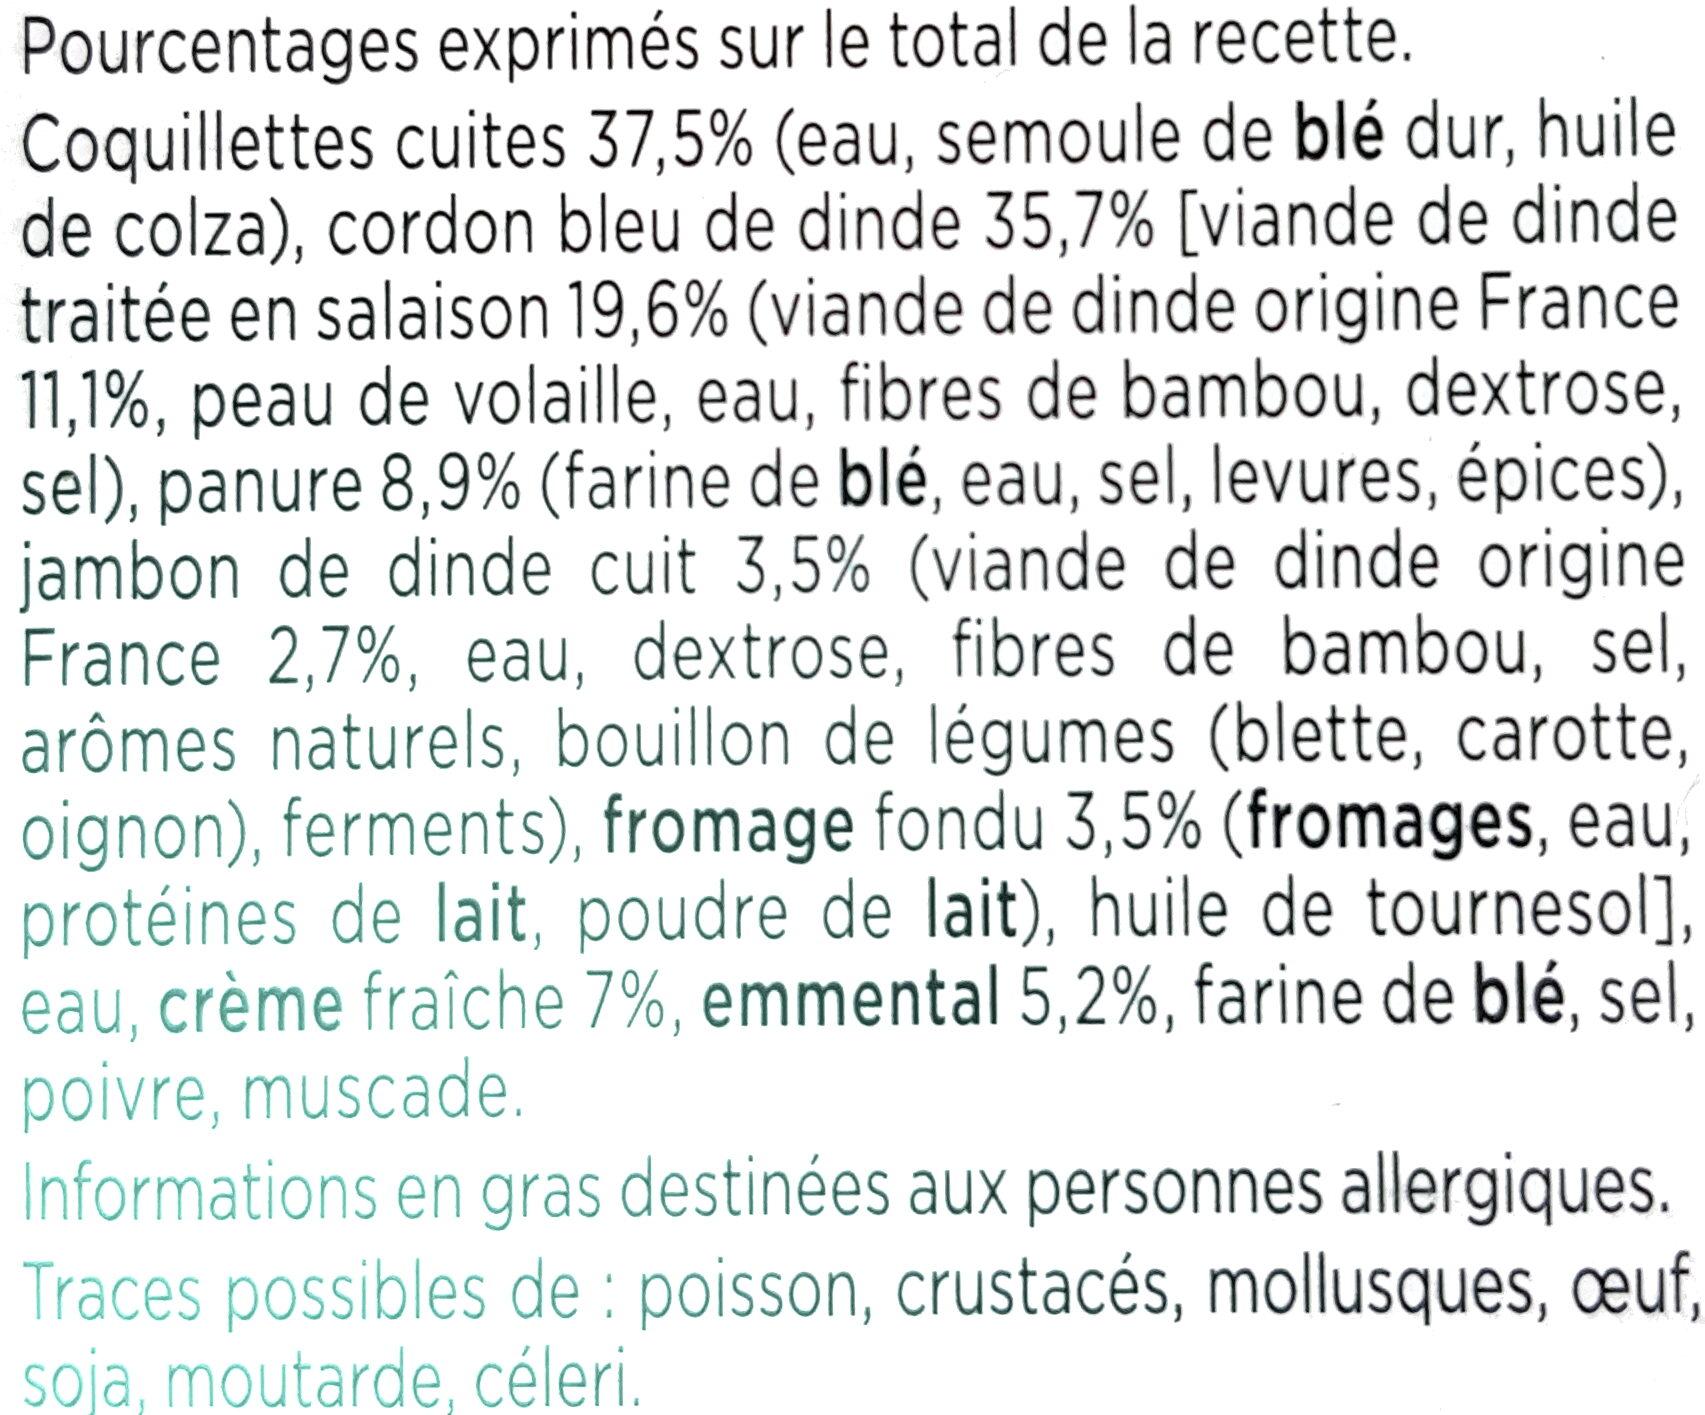 Cordon Bleu de Dinde, Coquillettes à l'emmental - Ingrediënten - fr